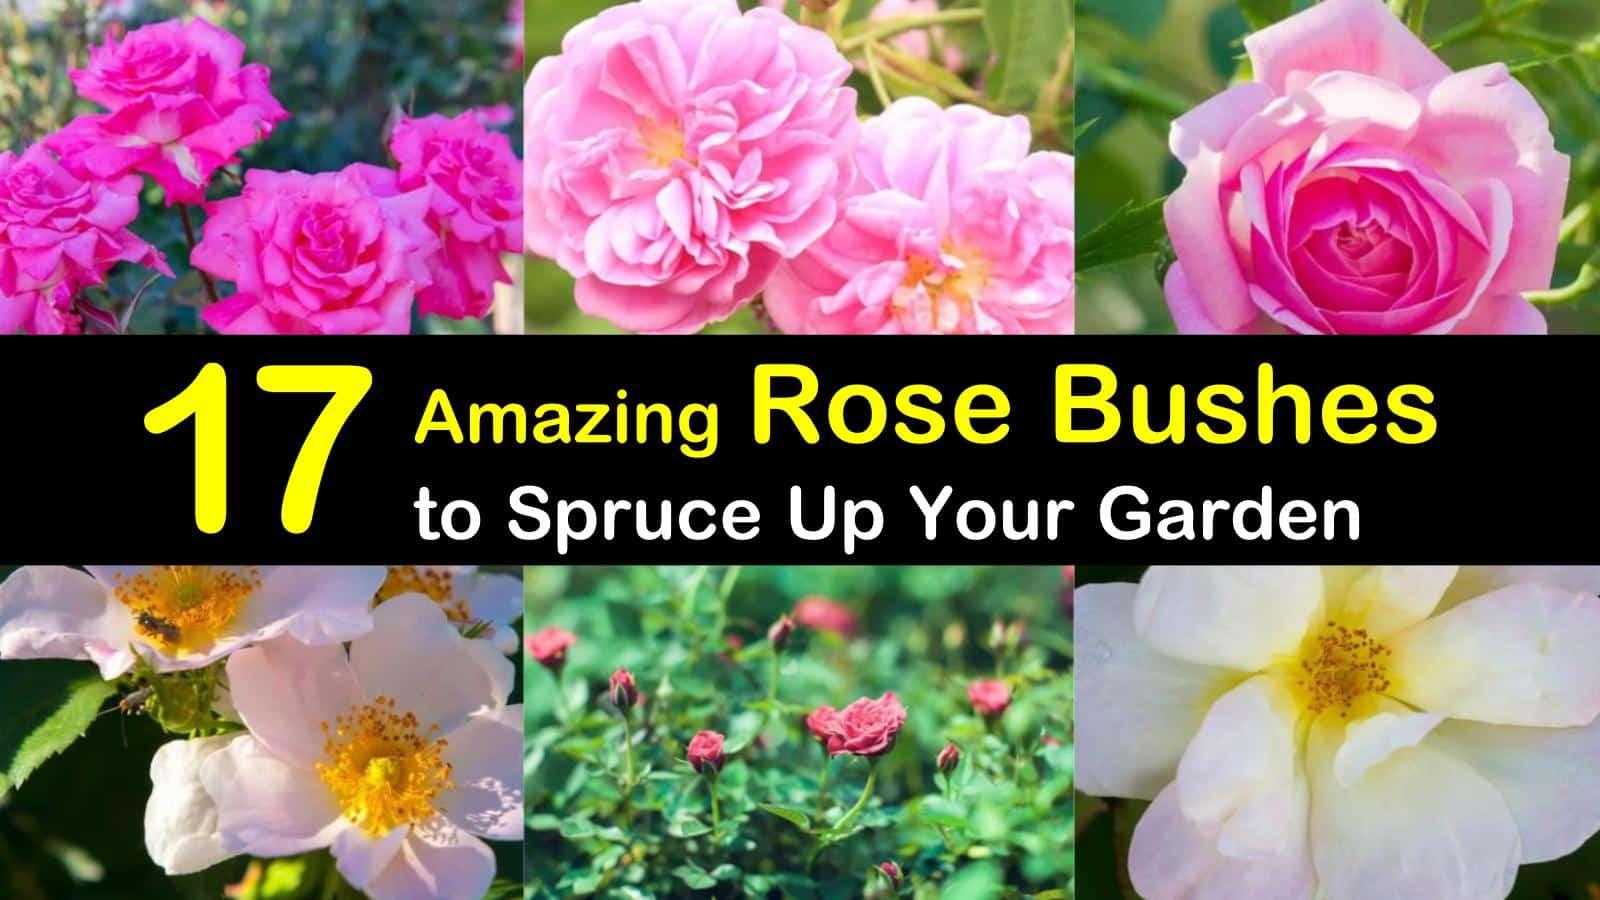 rose bushes titleimg1